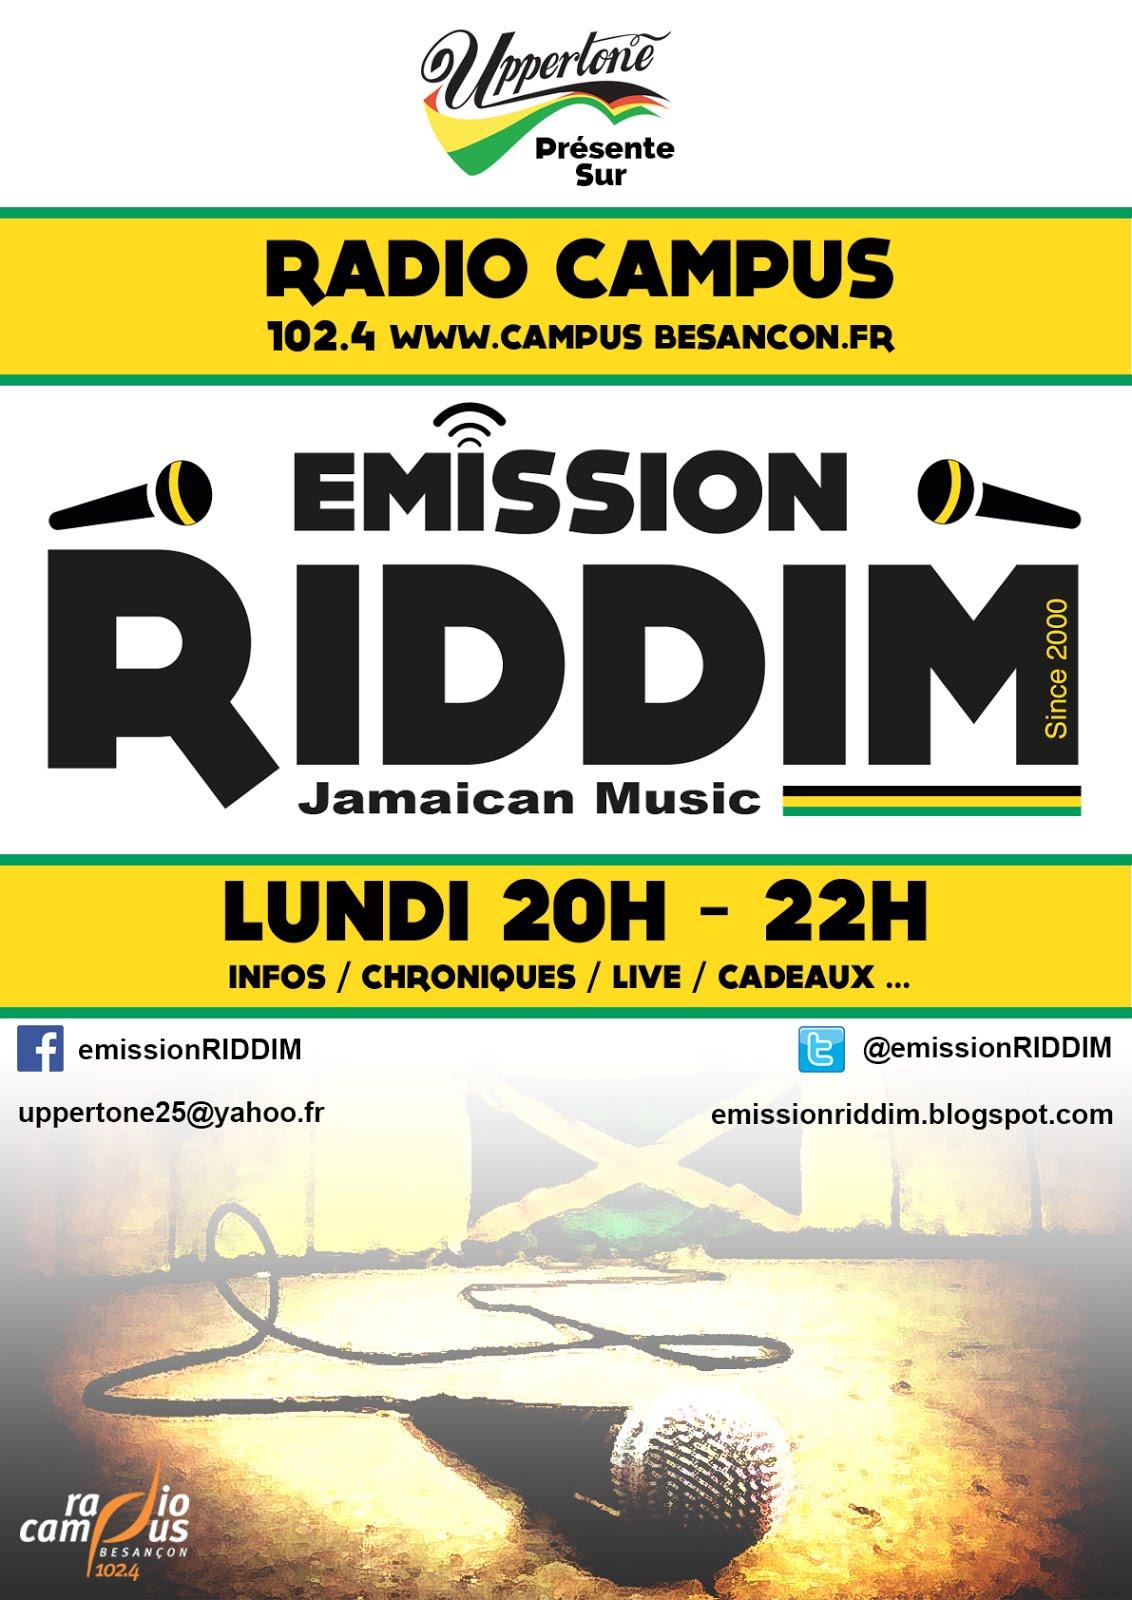 Emission Riddim